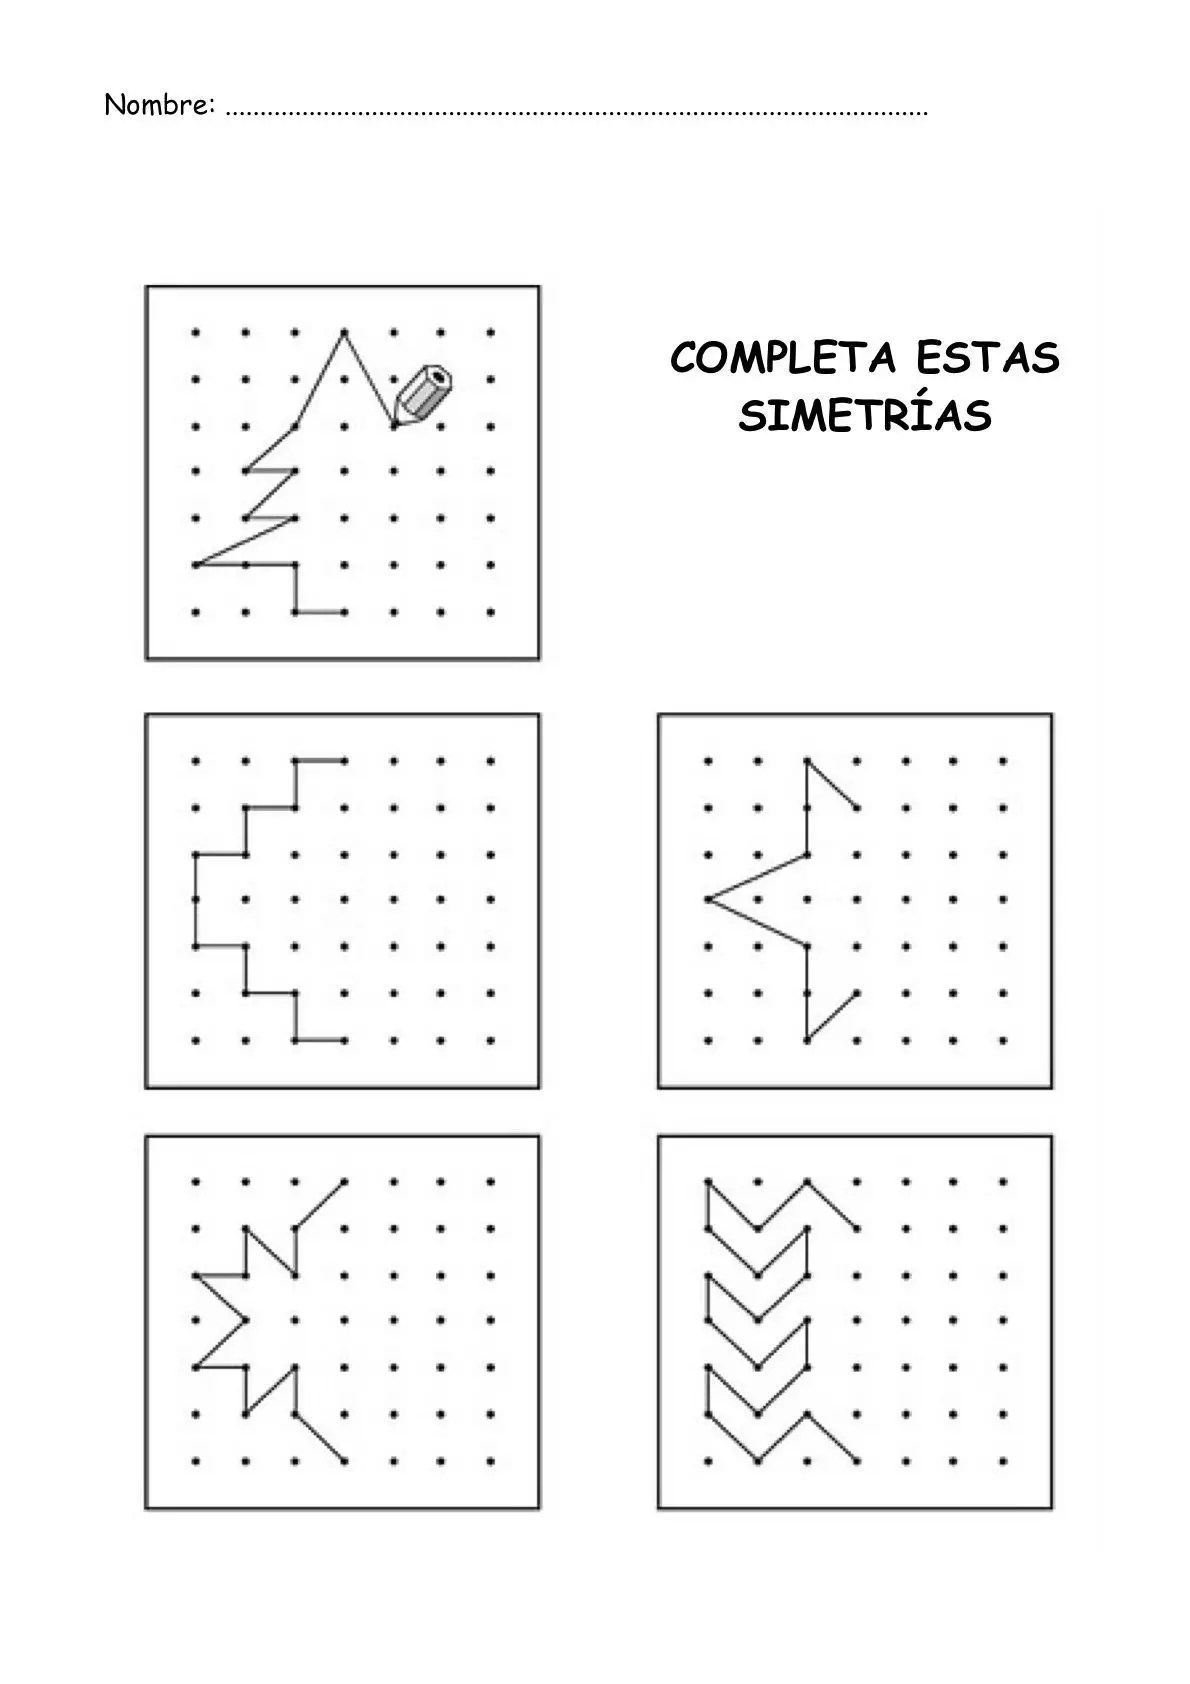 Completar Simetrias